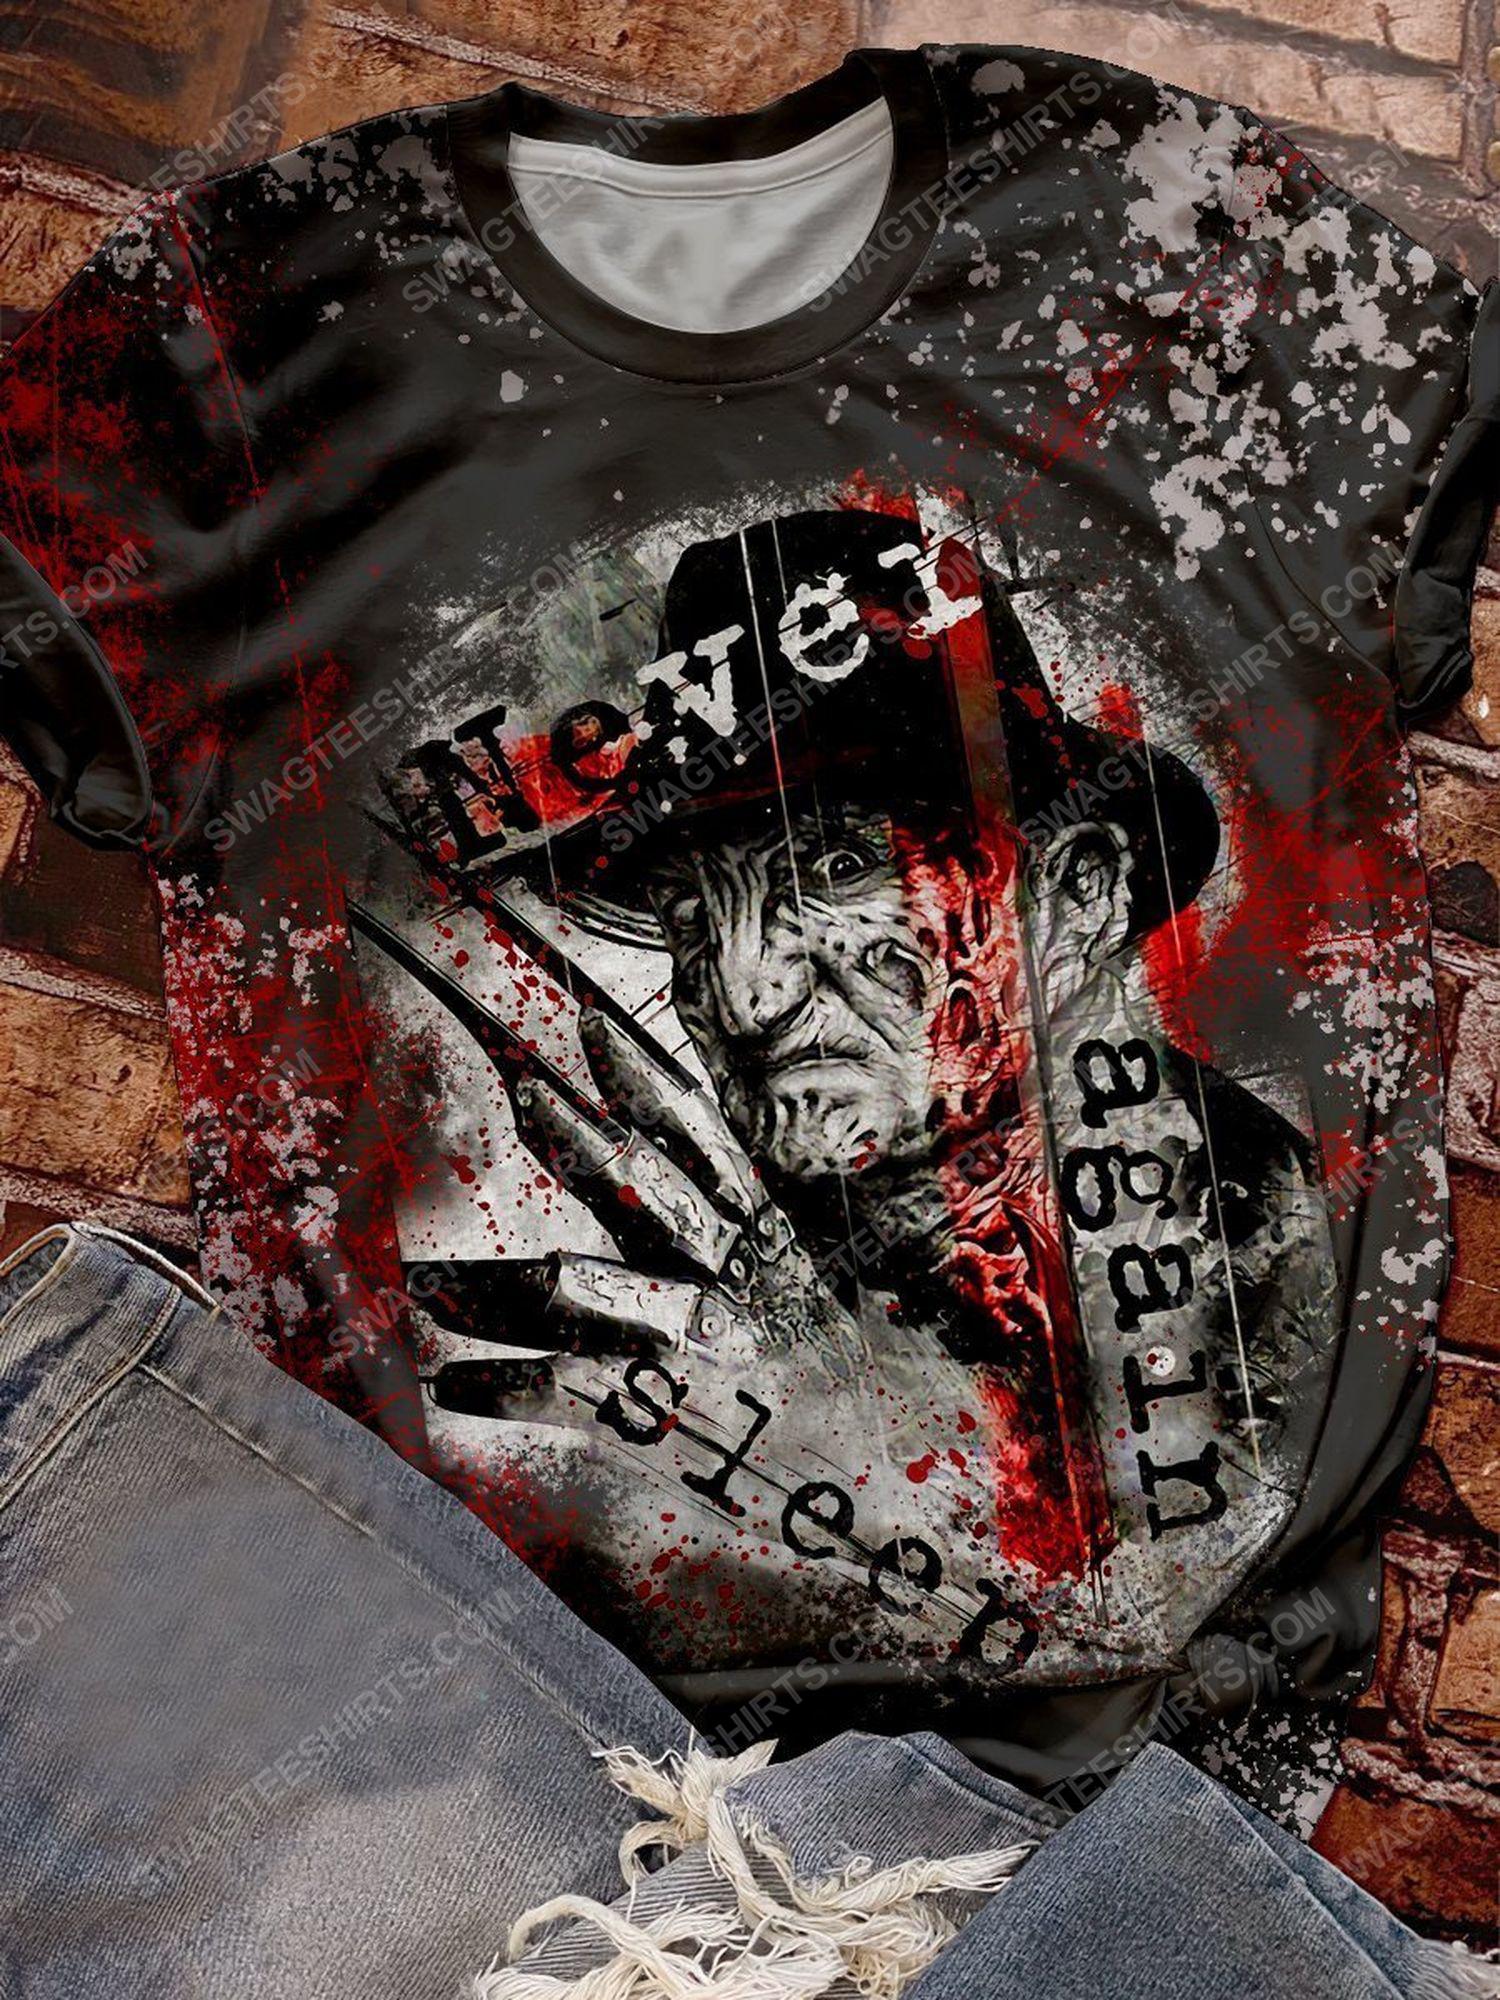 Halloween freddy's nightmares never sleep again shirt 1 - Copy